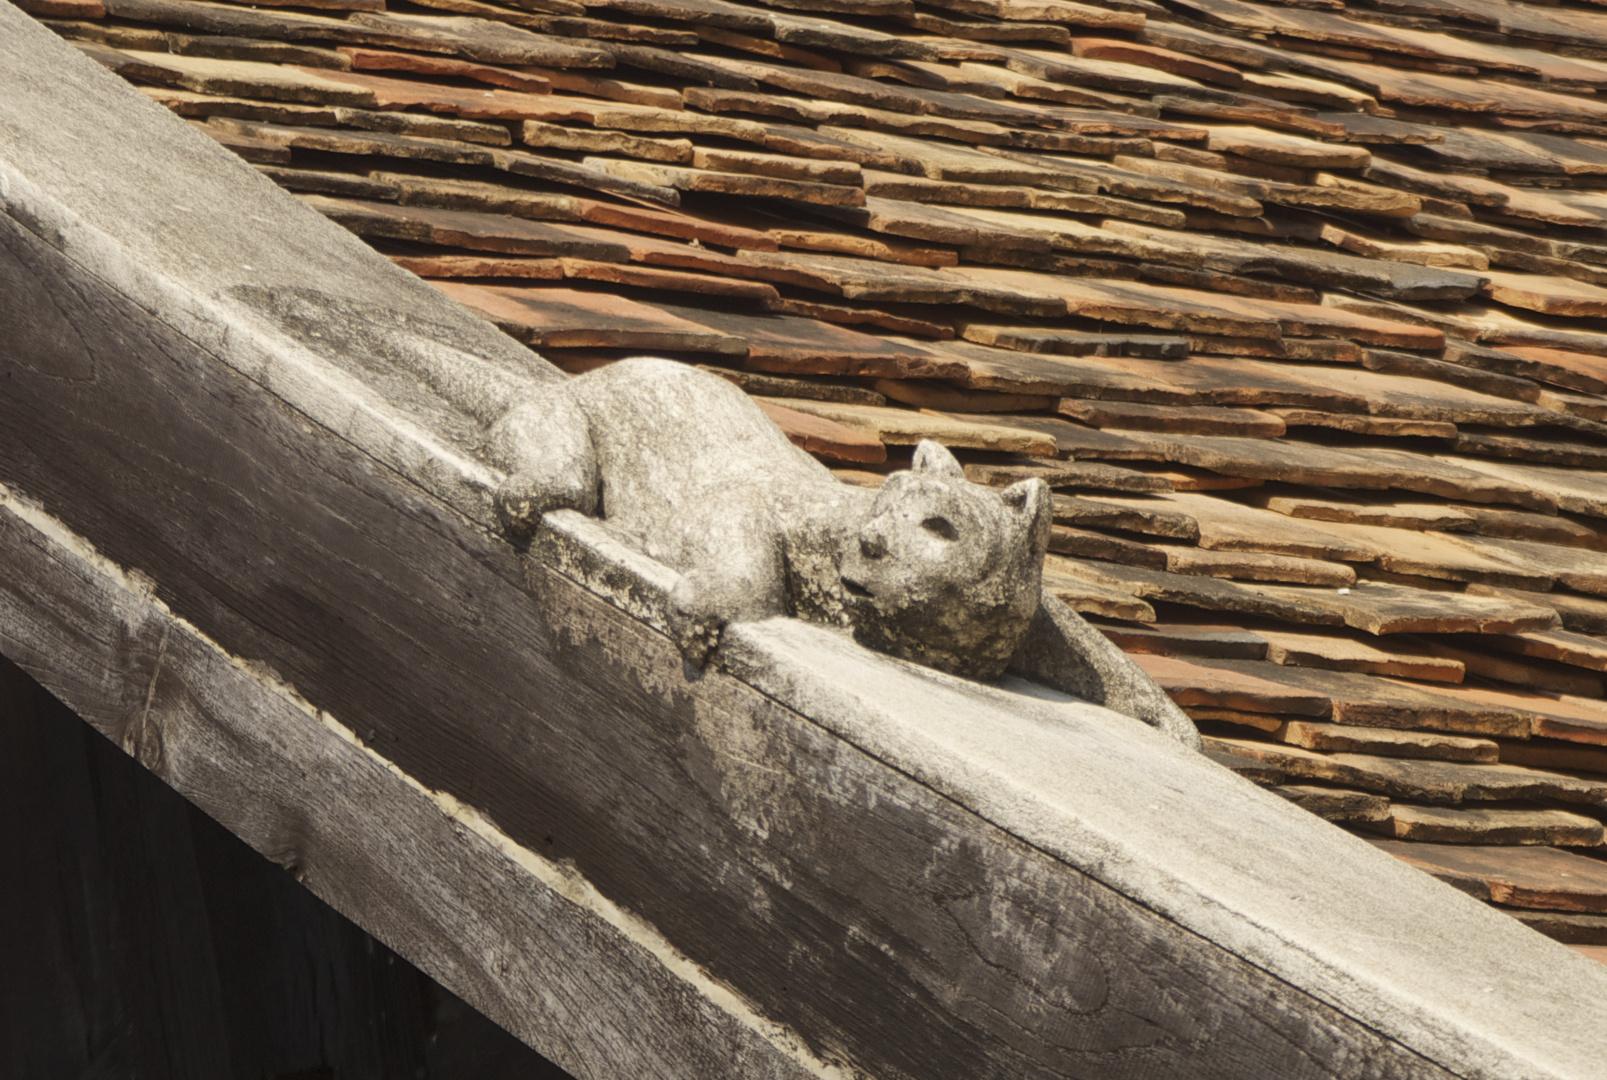 Thai Katze mal etwas anders